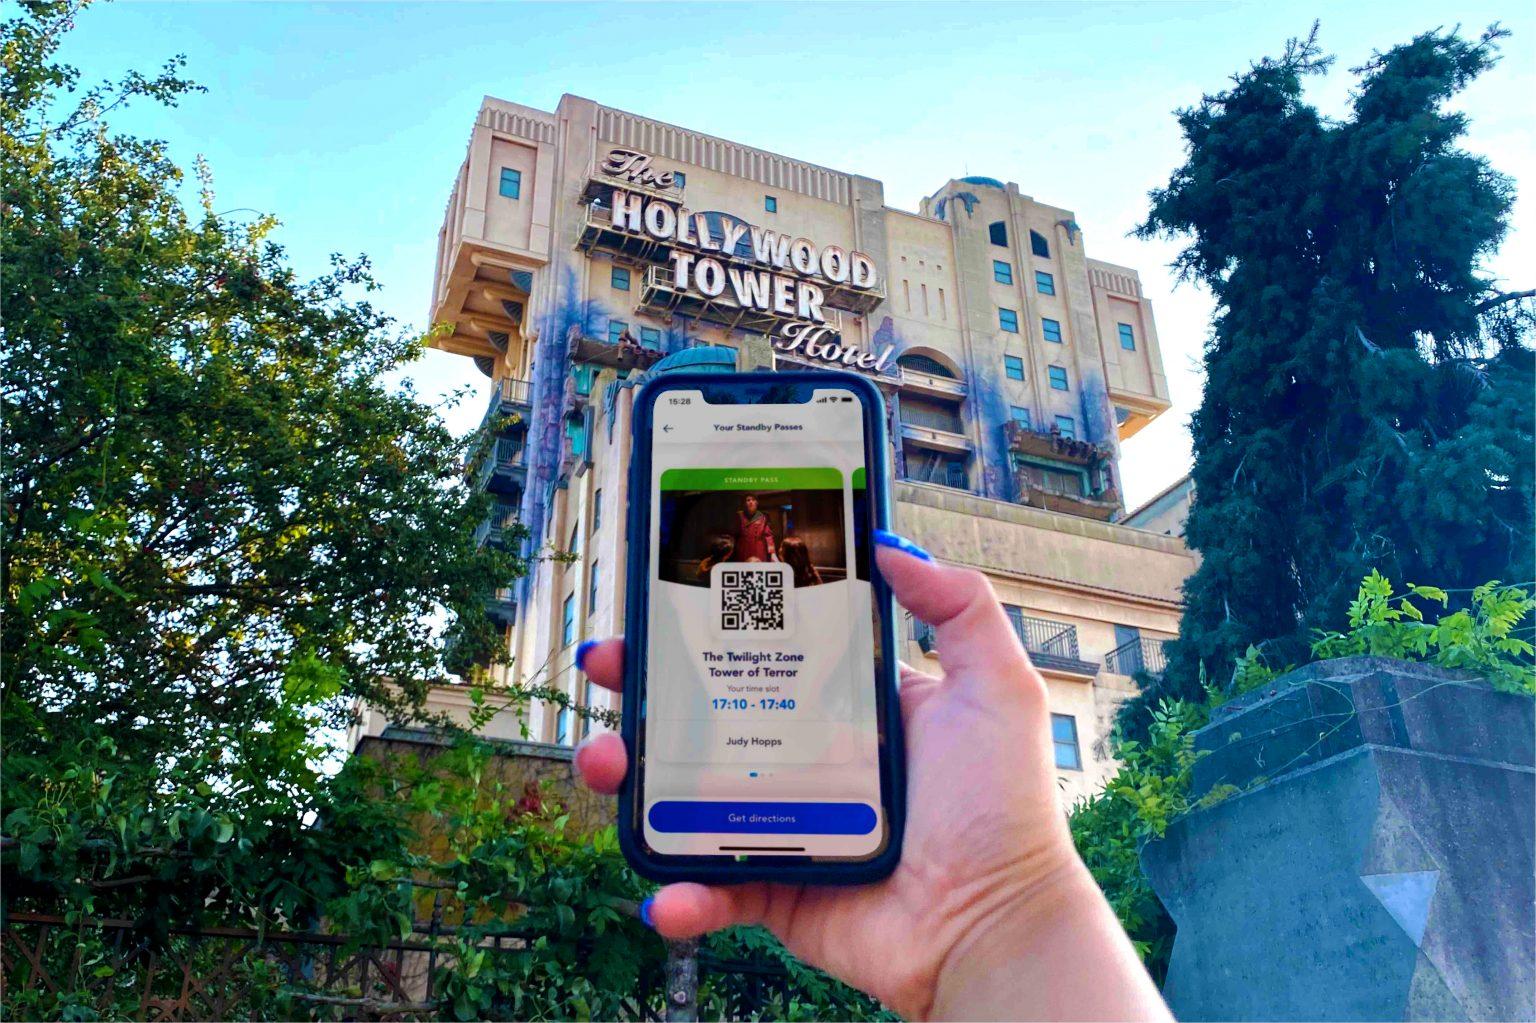 Standbay pass app para Disneyland París